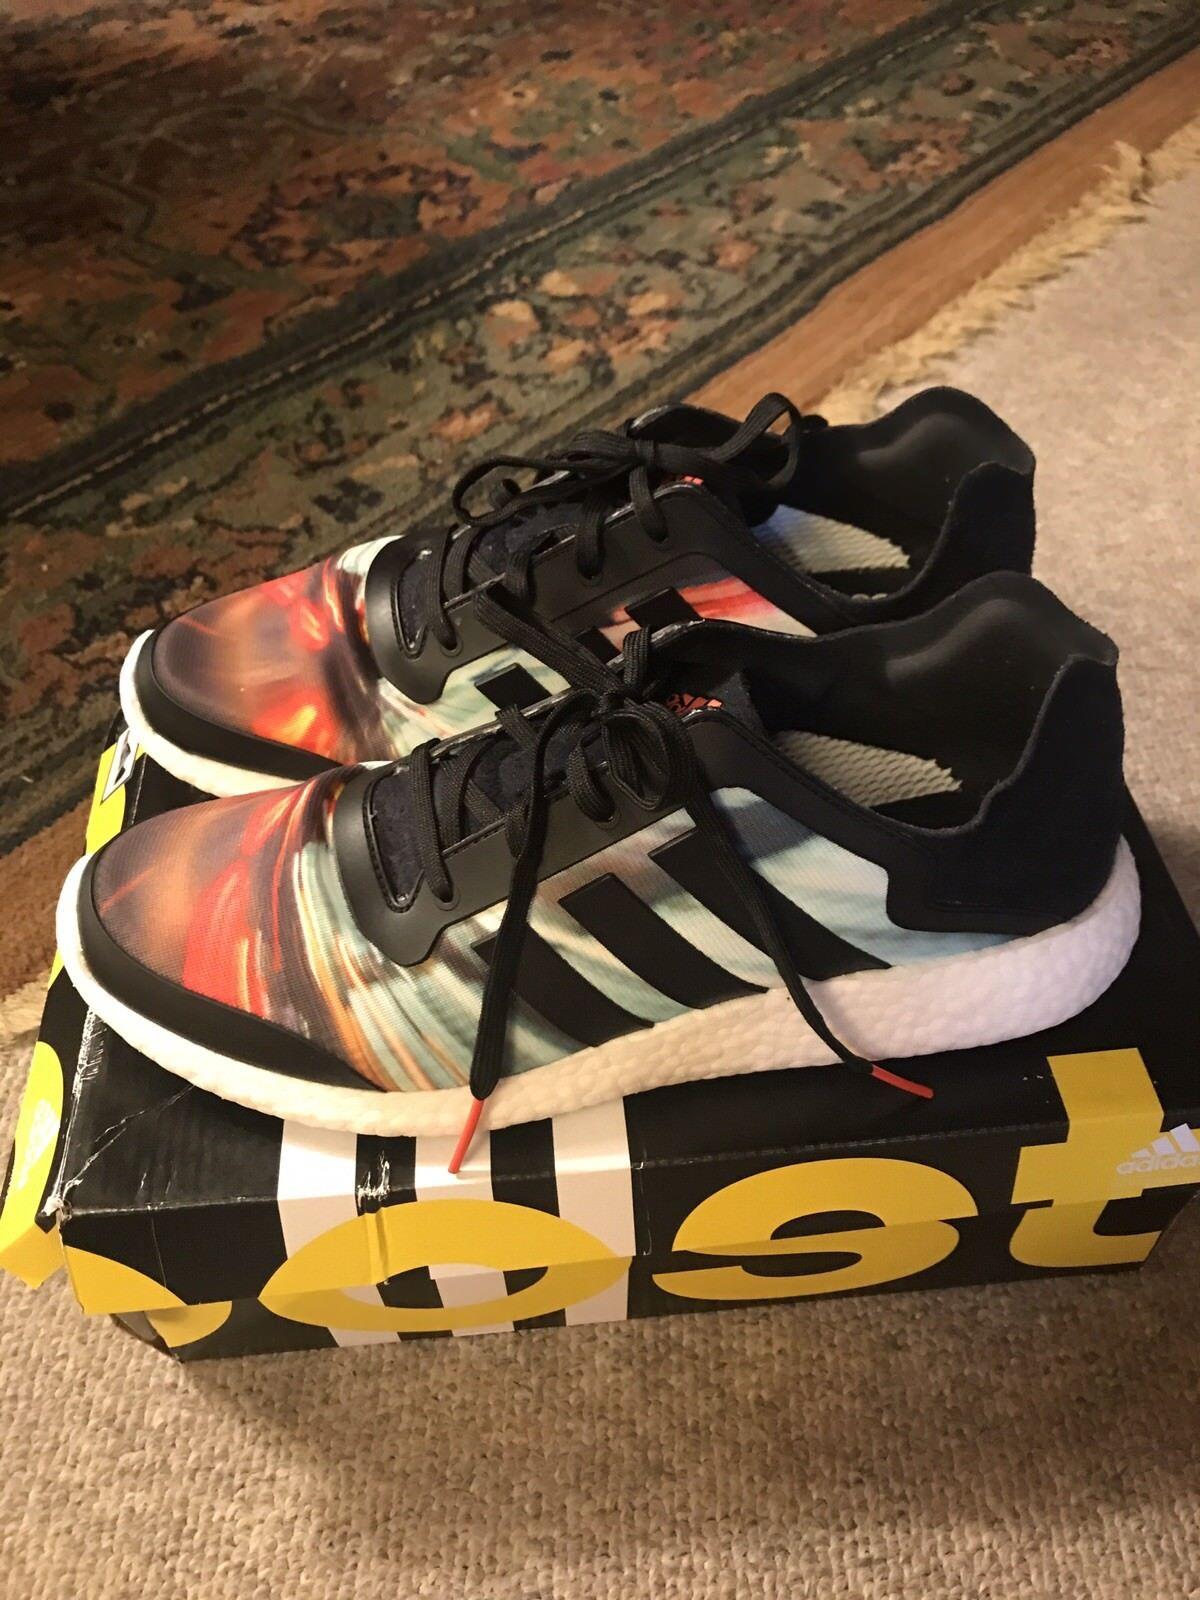 Adidas PureBoost DPR LTD Rainbow Multi Color CG2993 Men Size 11 pureboost ultra